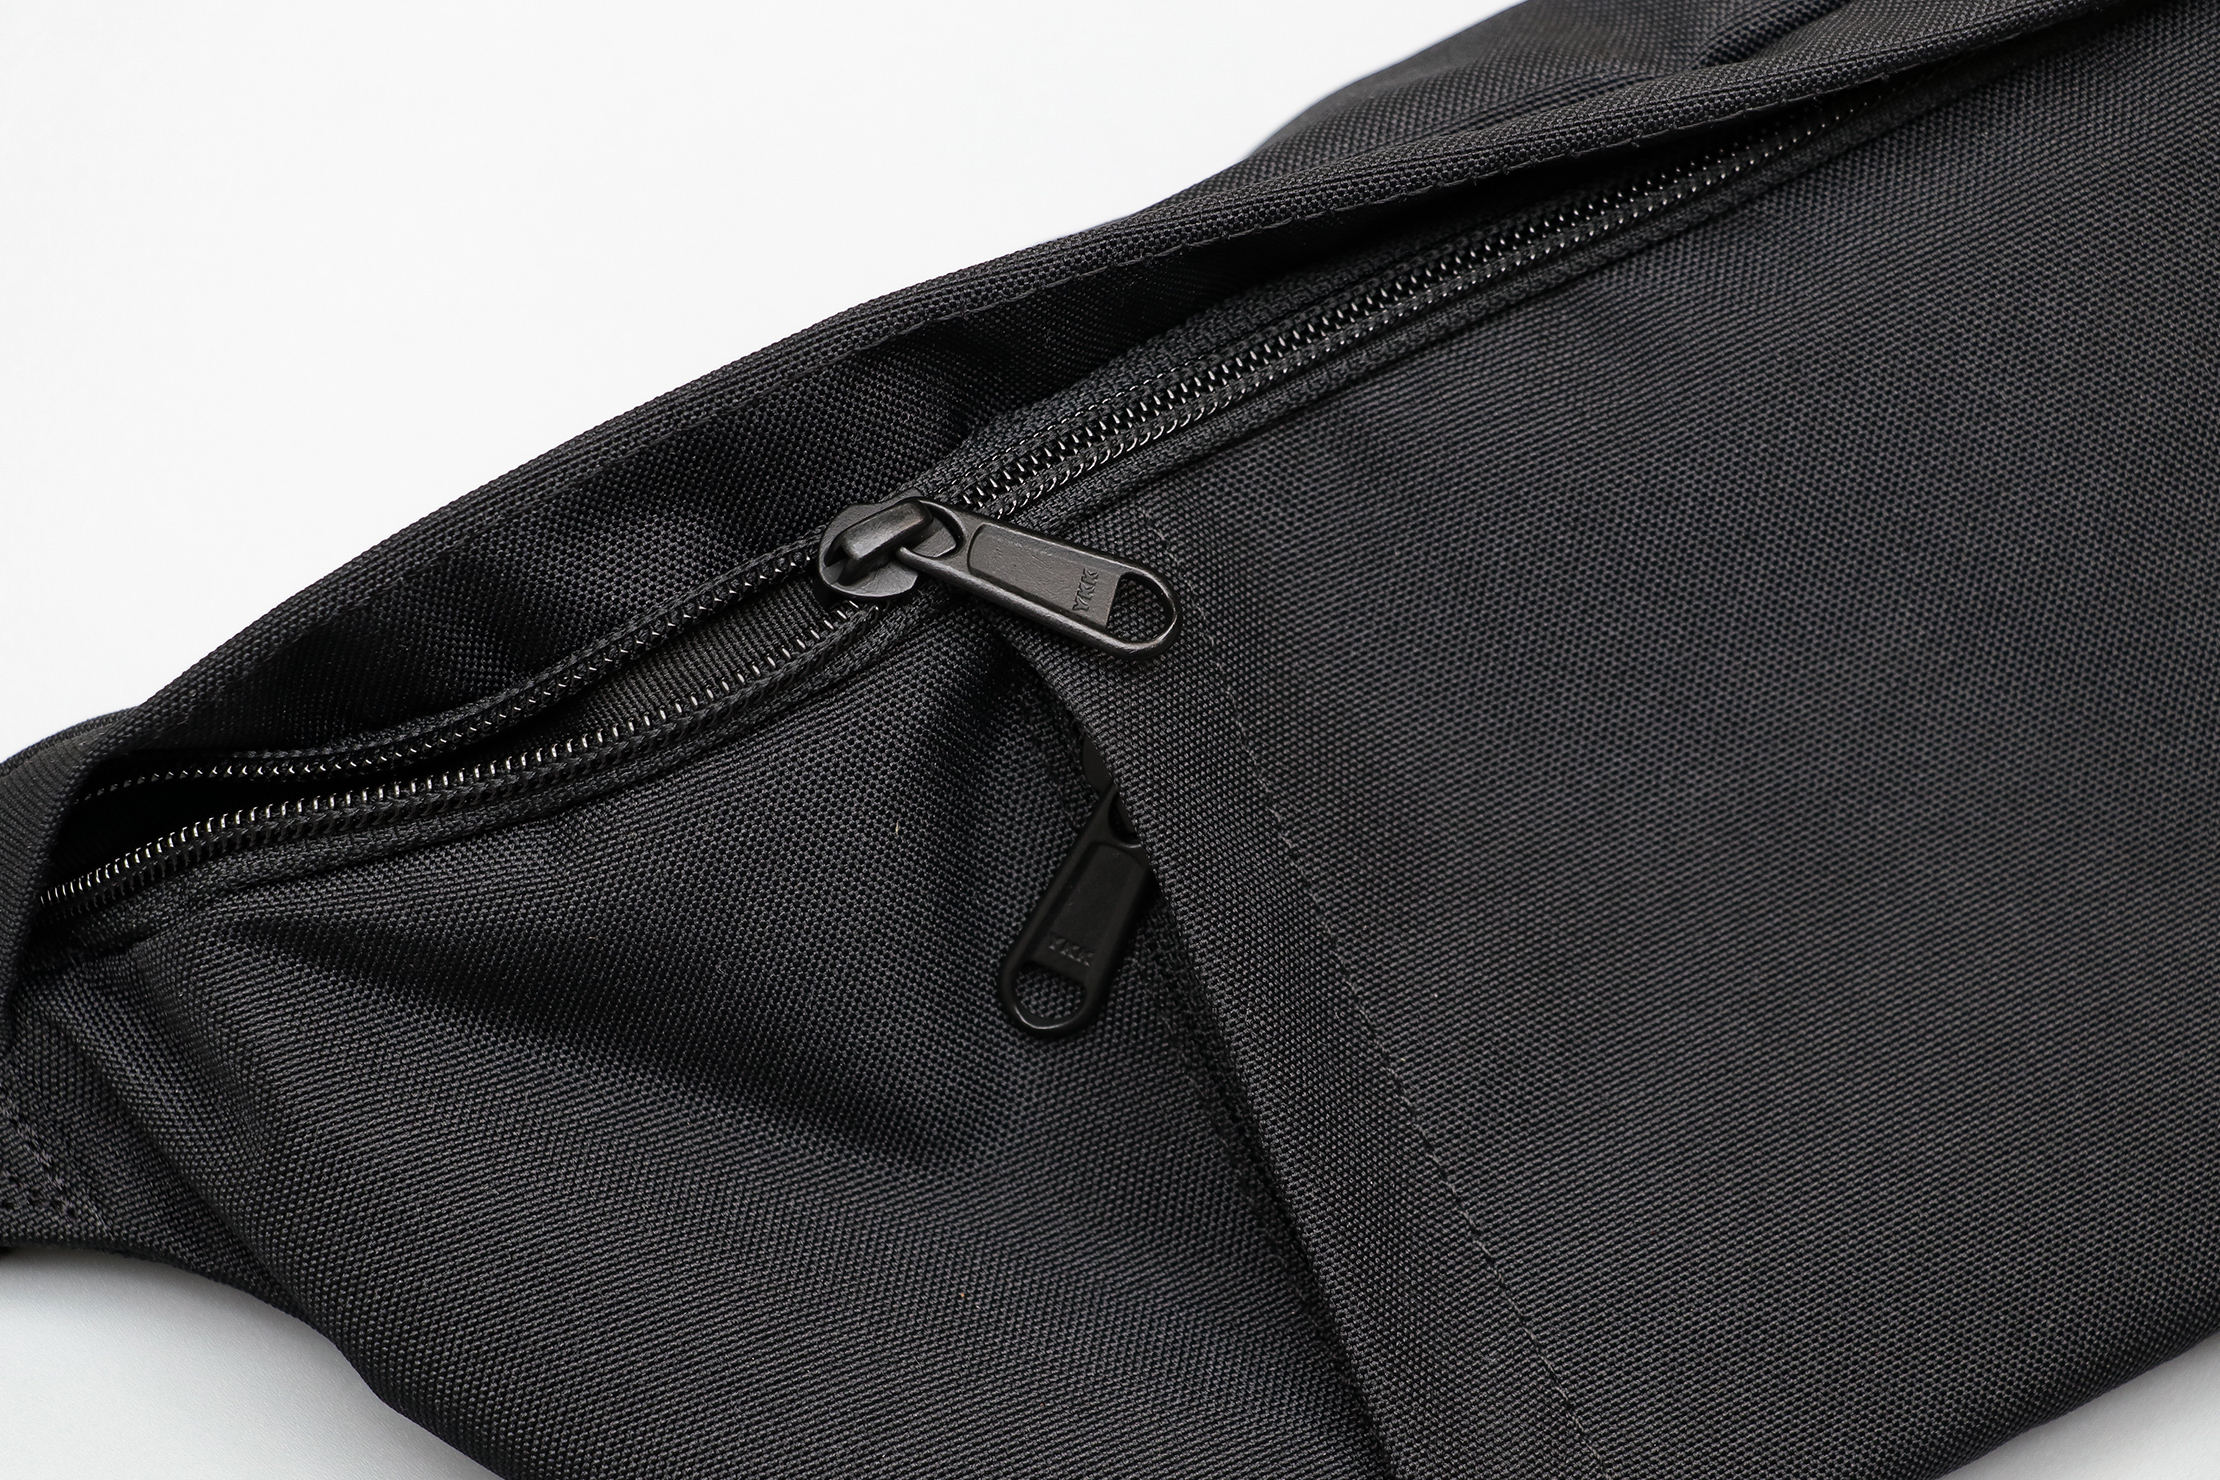 CabinZero Hip Pack 2L Zippers